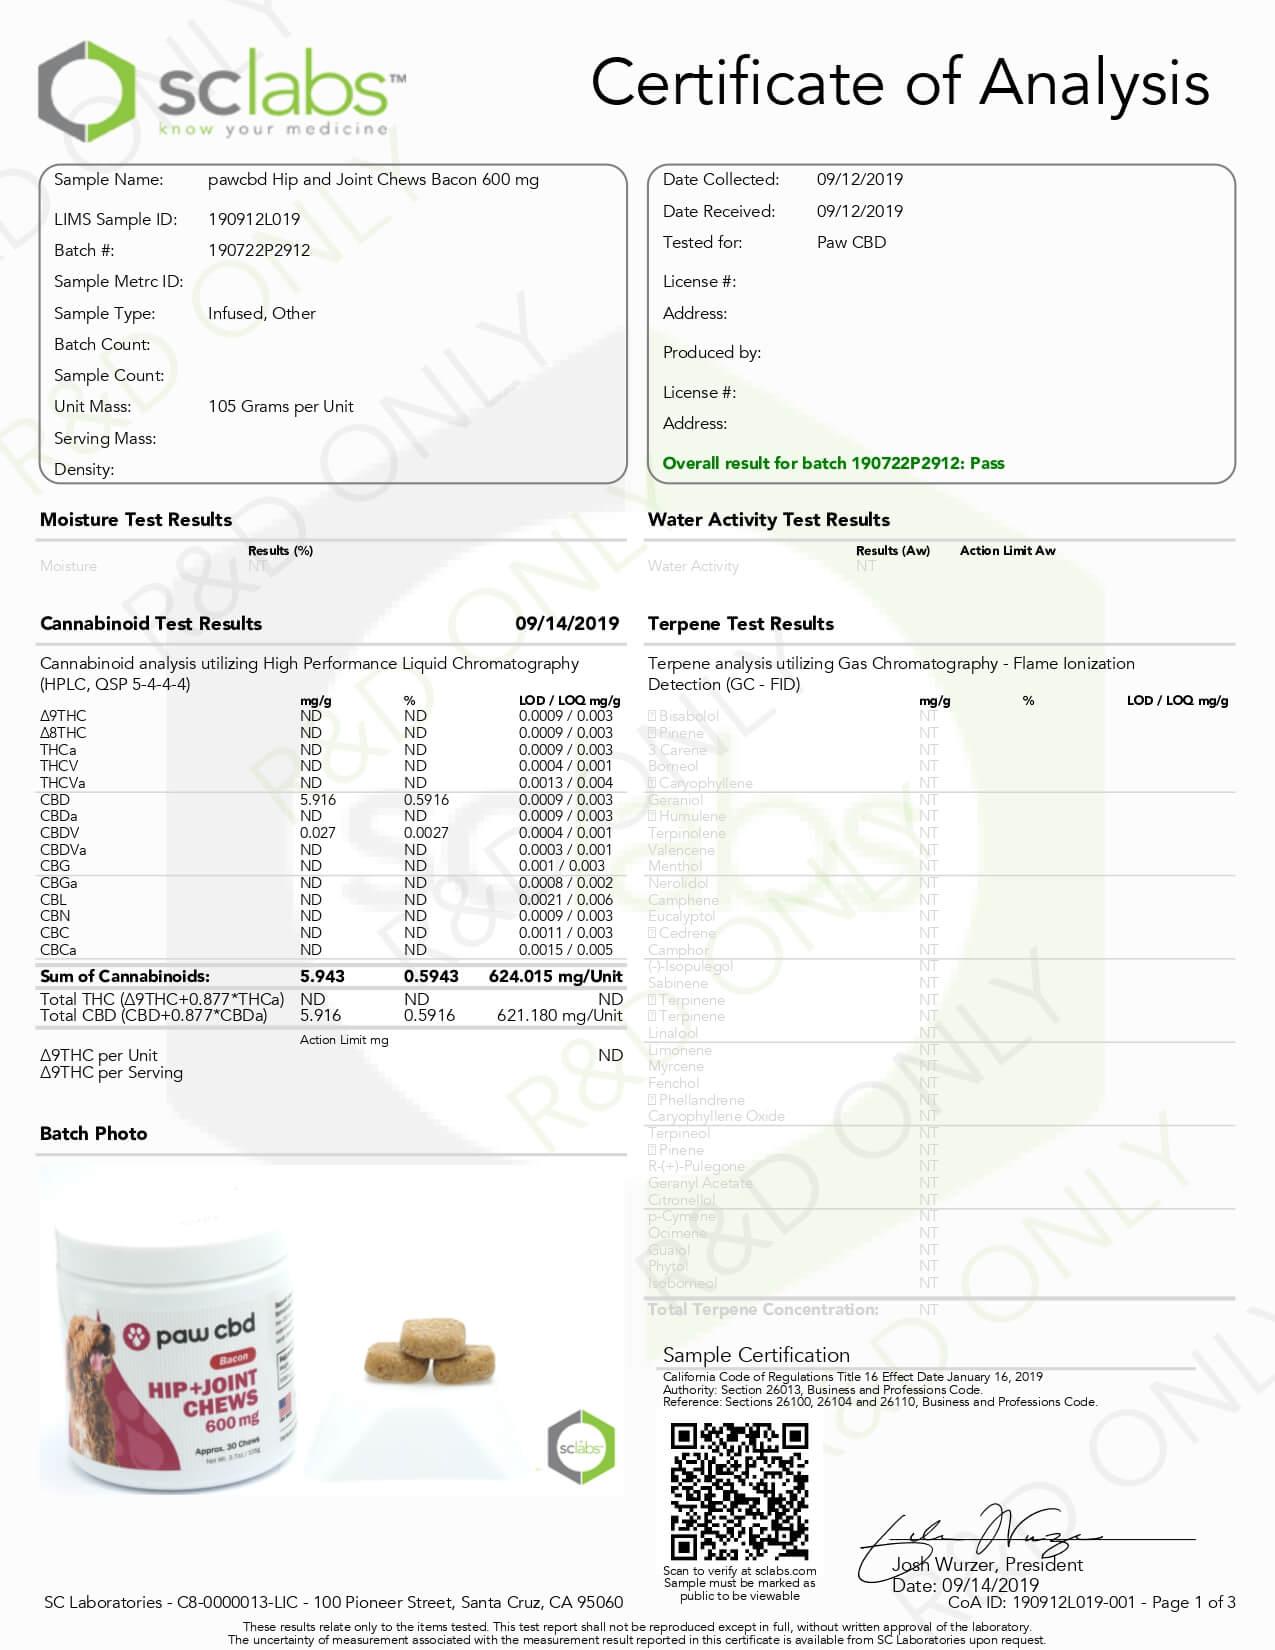 cbdMD CBD Pet Treats Bacon Canine Hip+Joint Chews 600mg Lab Report